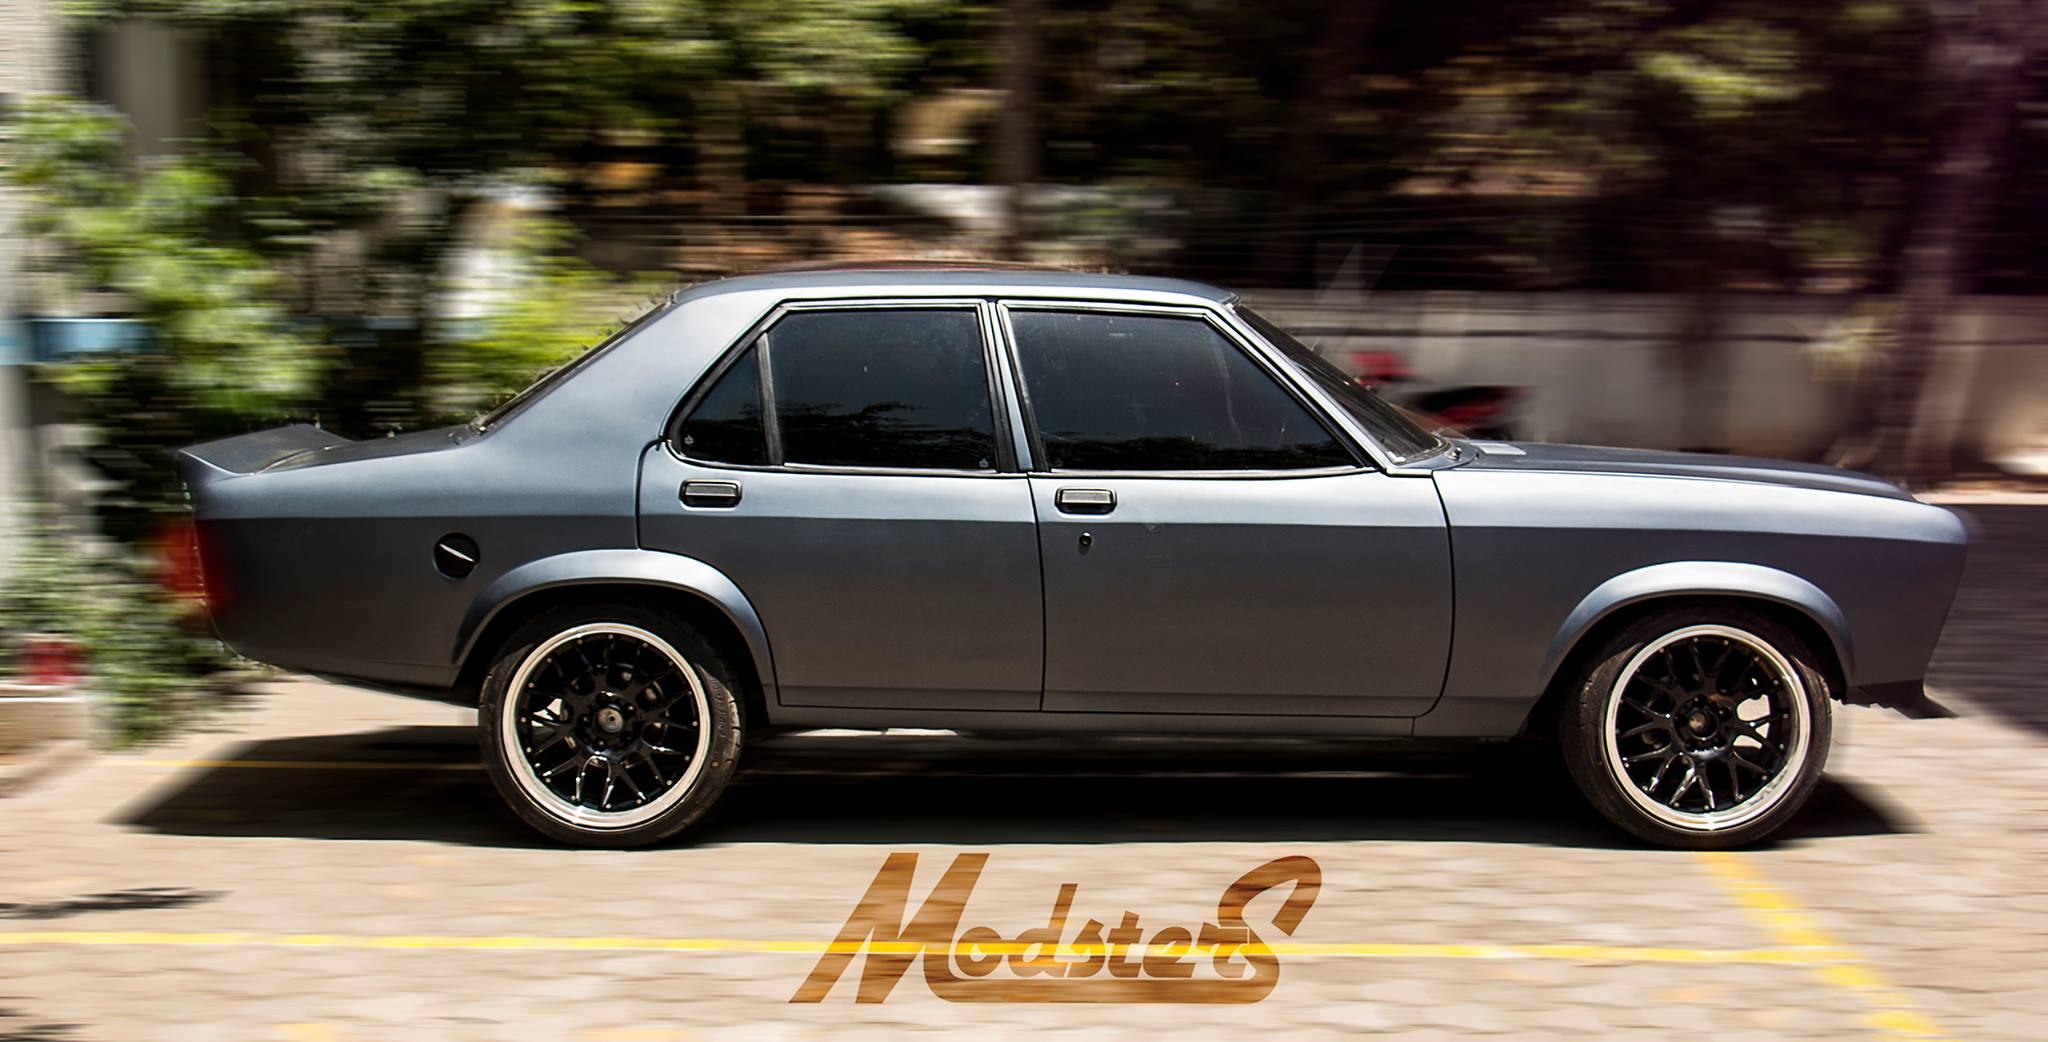 Hindustan Contessa 1984 - 2002 Sedan #6